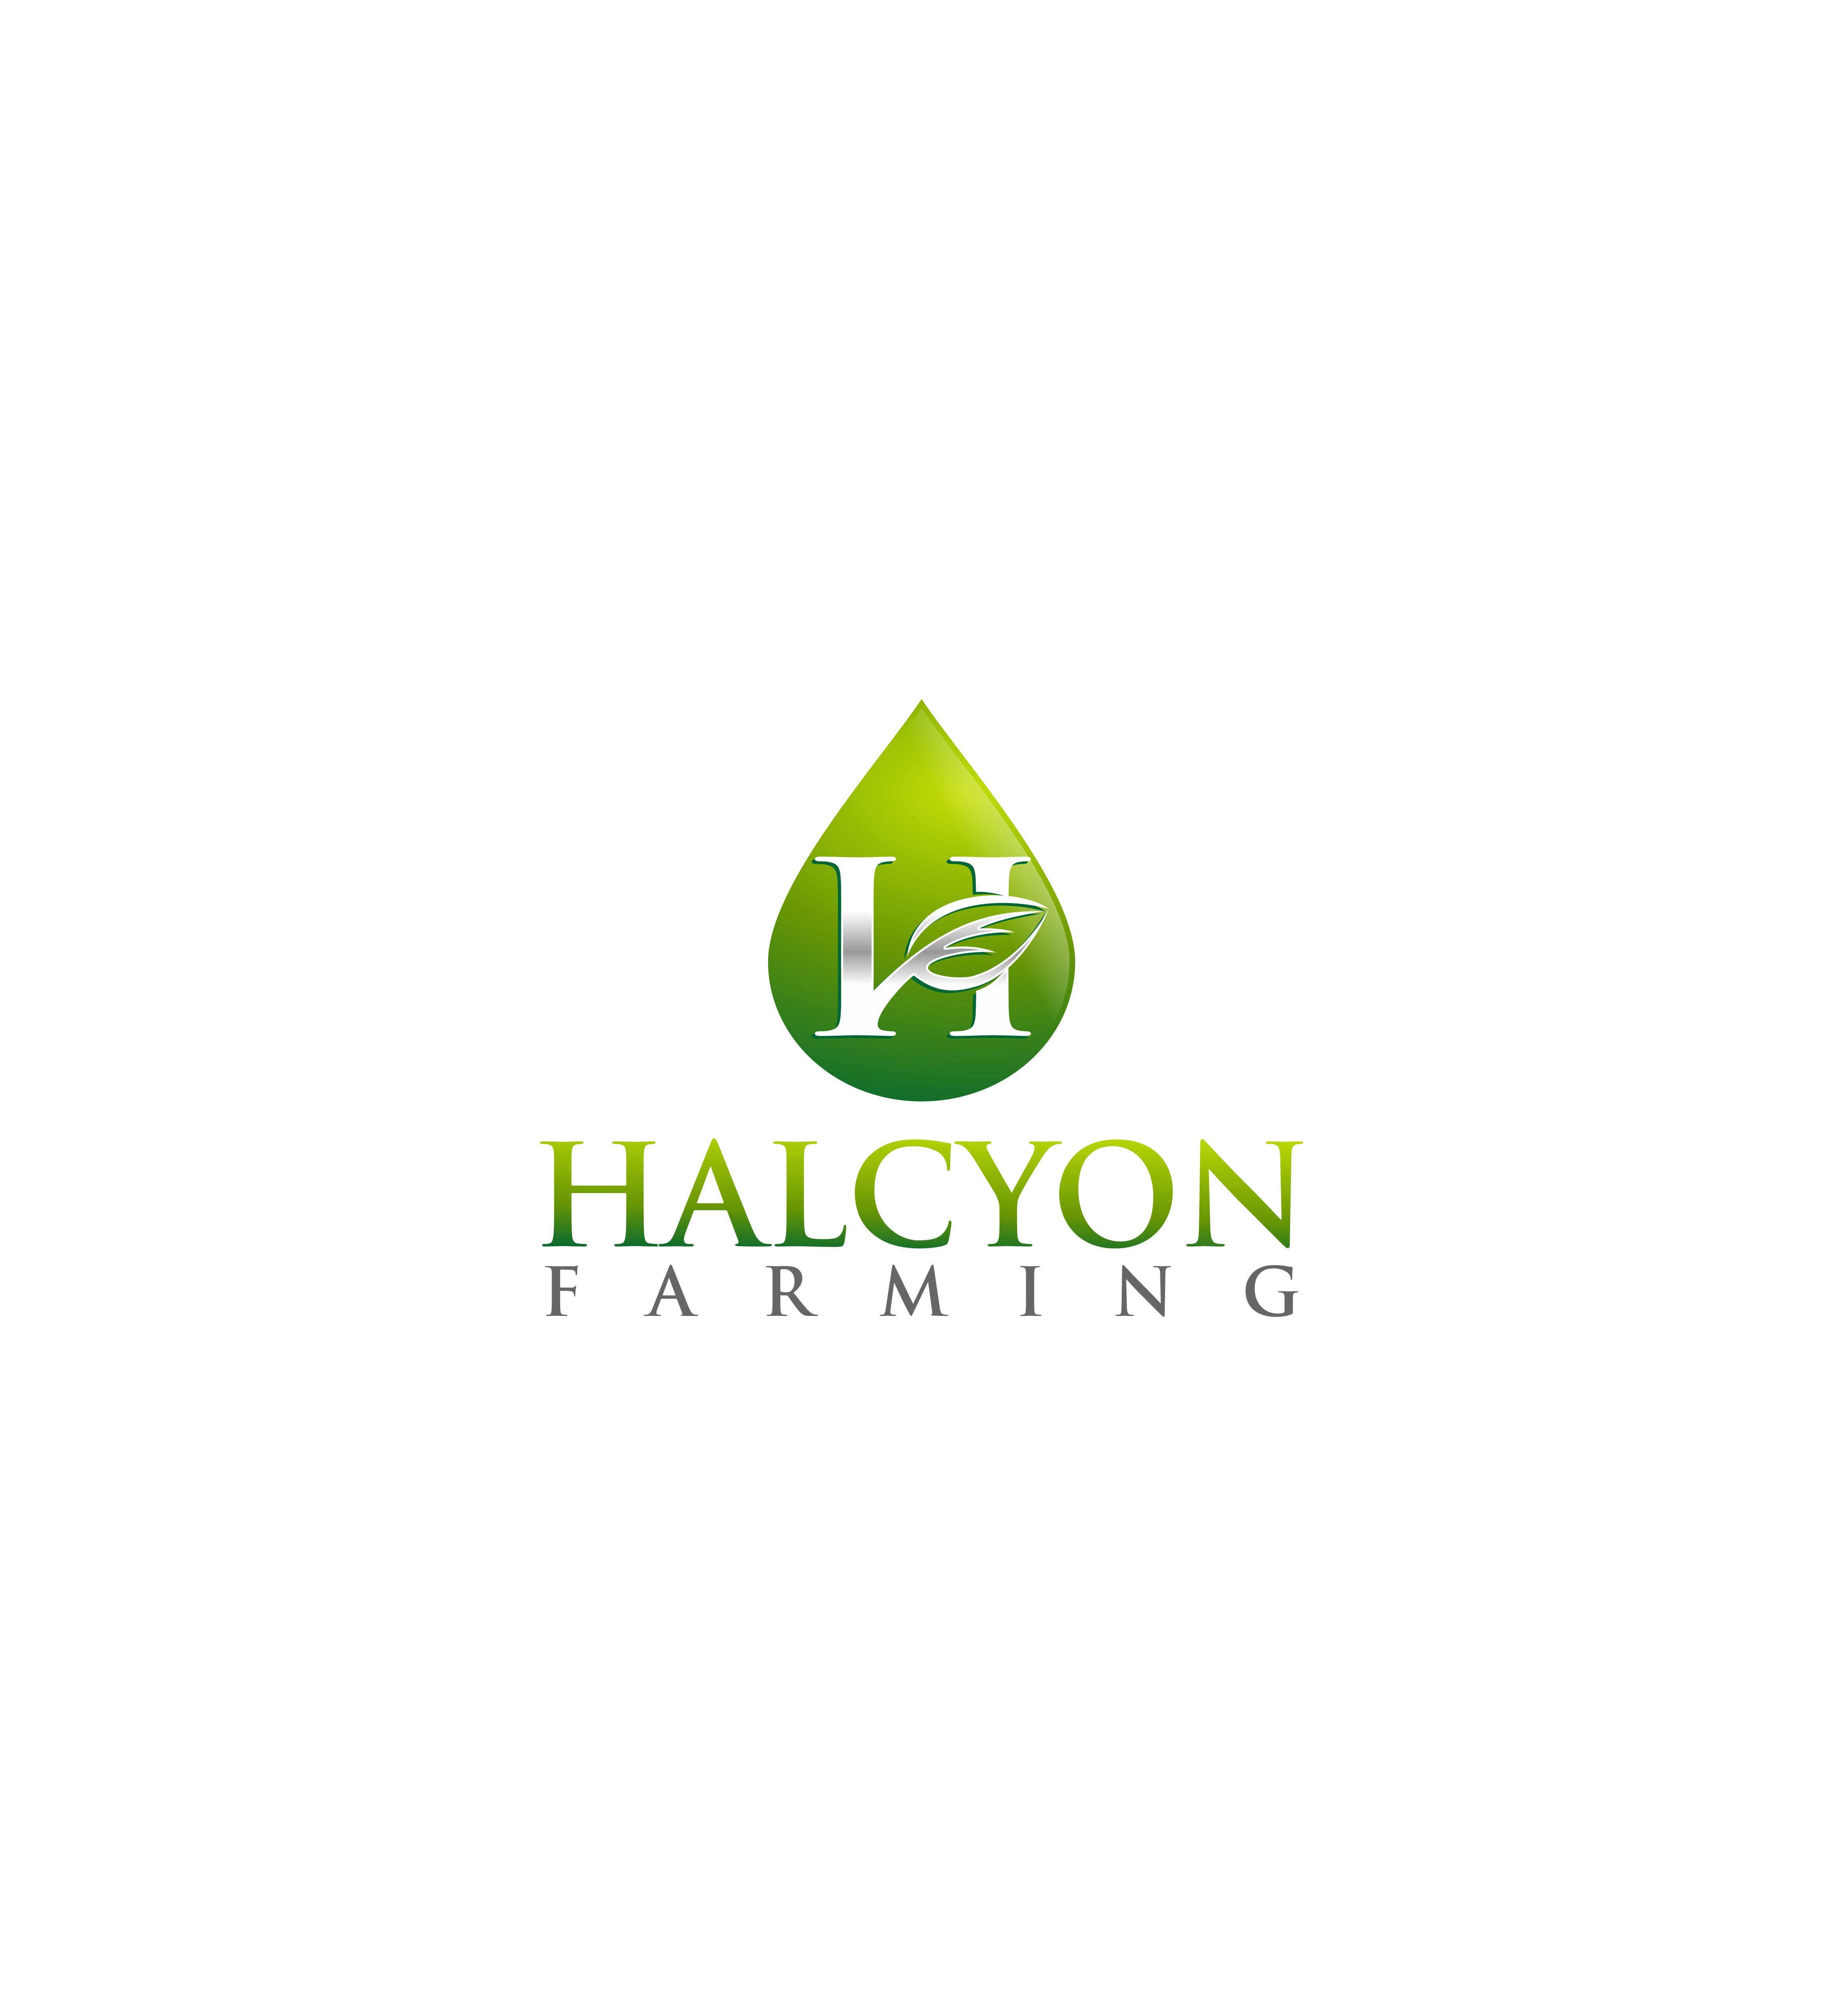 Logo Design by Raymond Garcia - Entry No. 108 in the Logo Design Contest Creative Logo Design for Halcyon Farming.